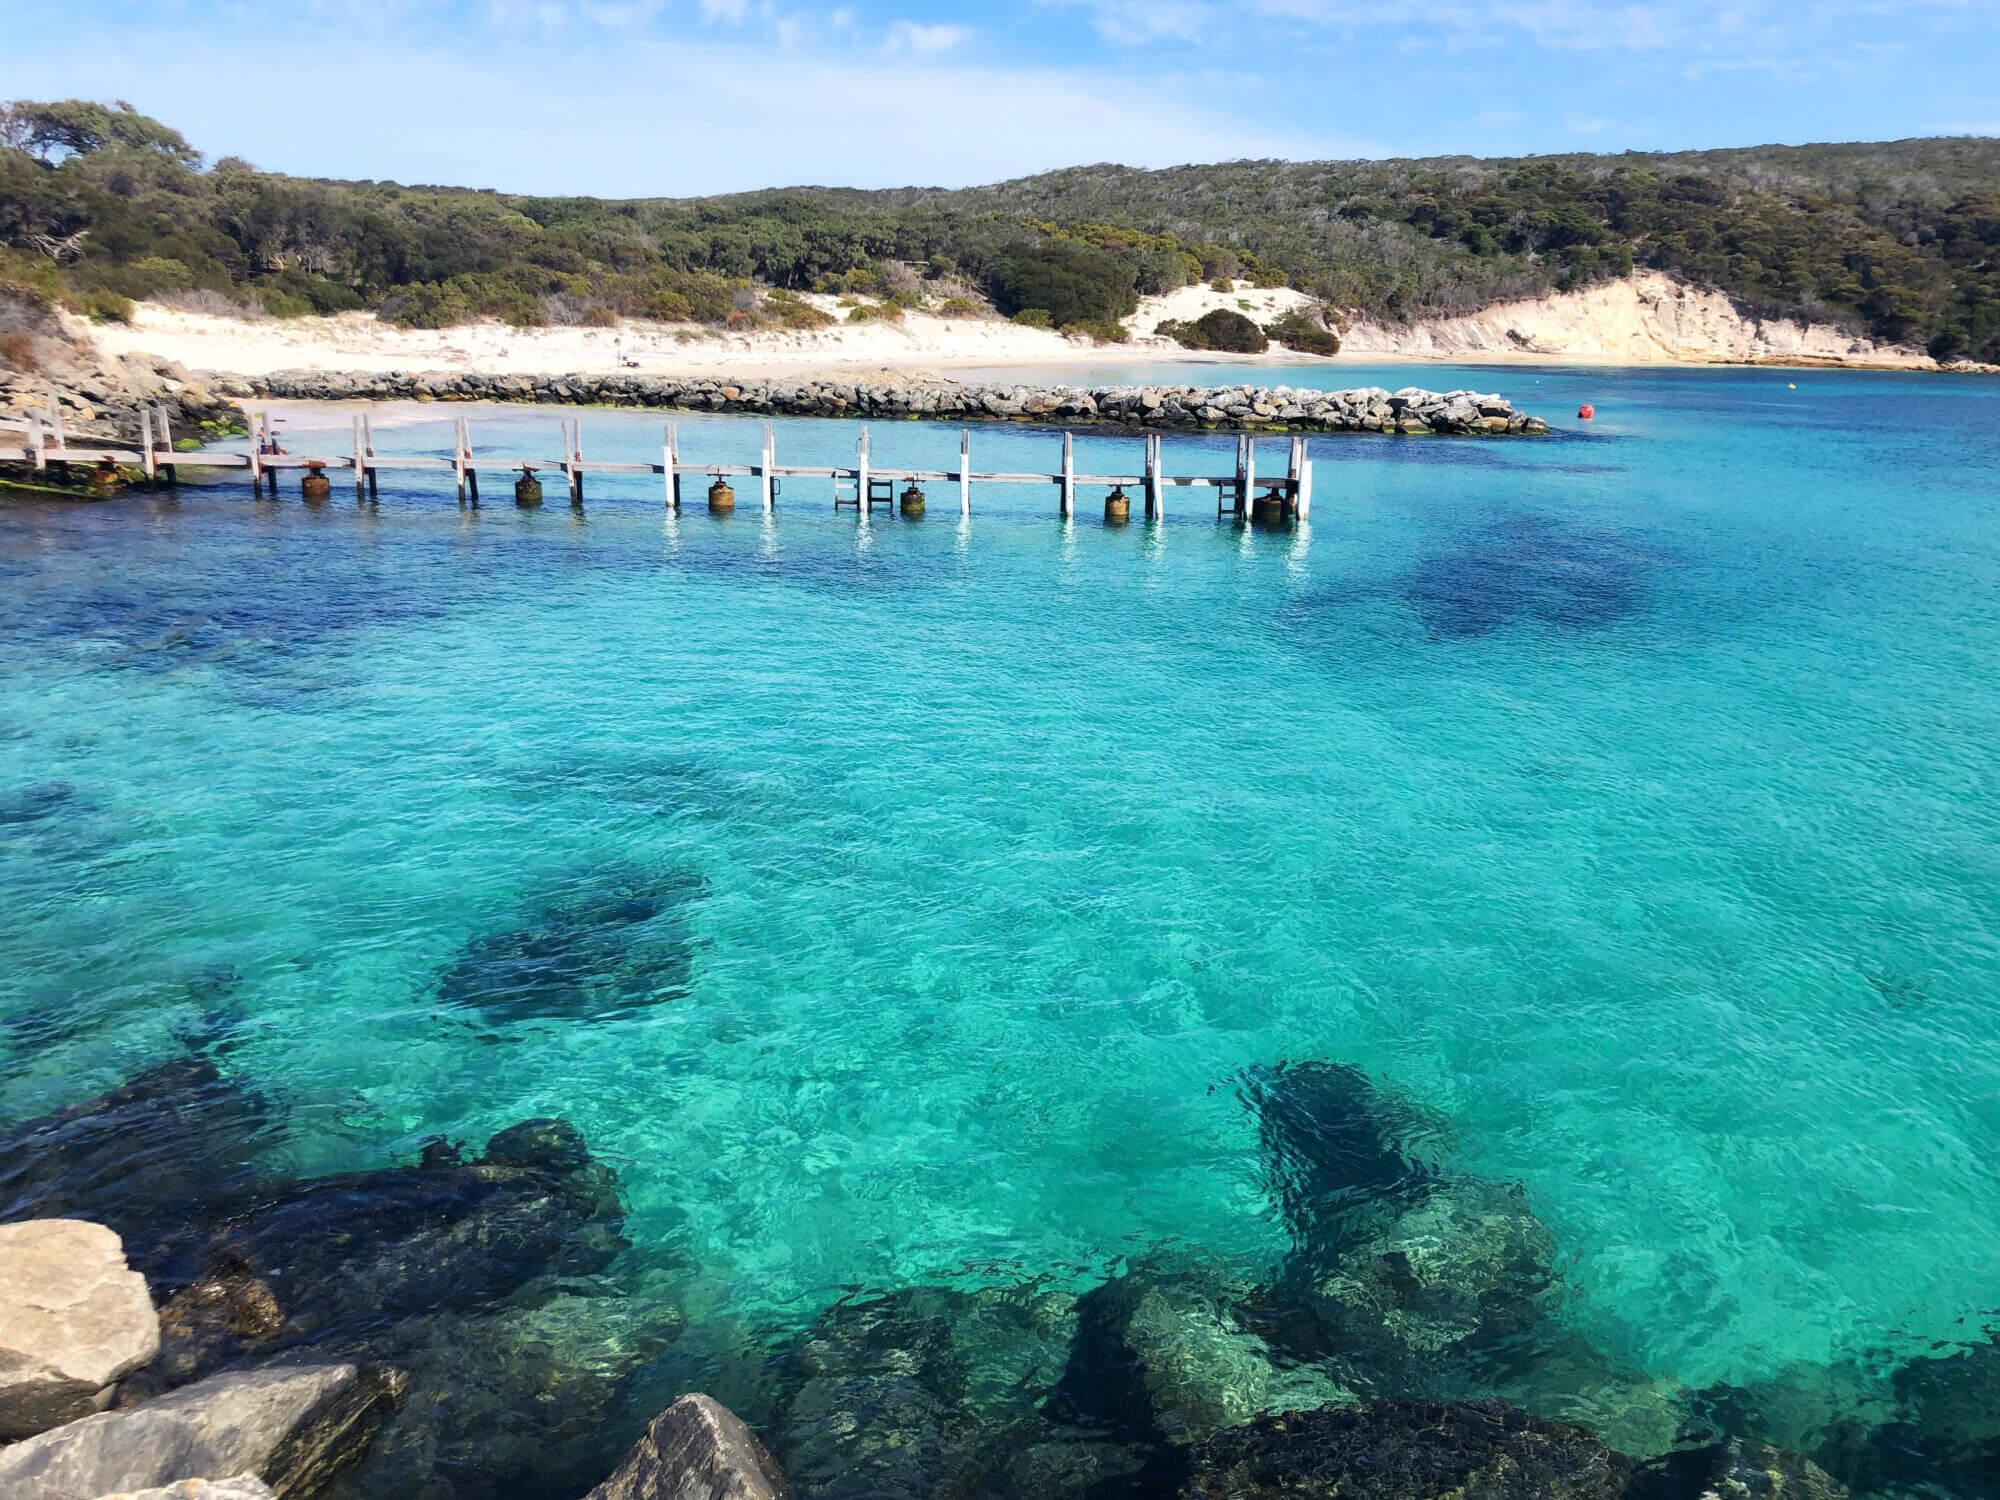 Marina Jetty, Bremer Bay - Credit: Alice Reddington Photography